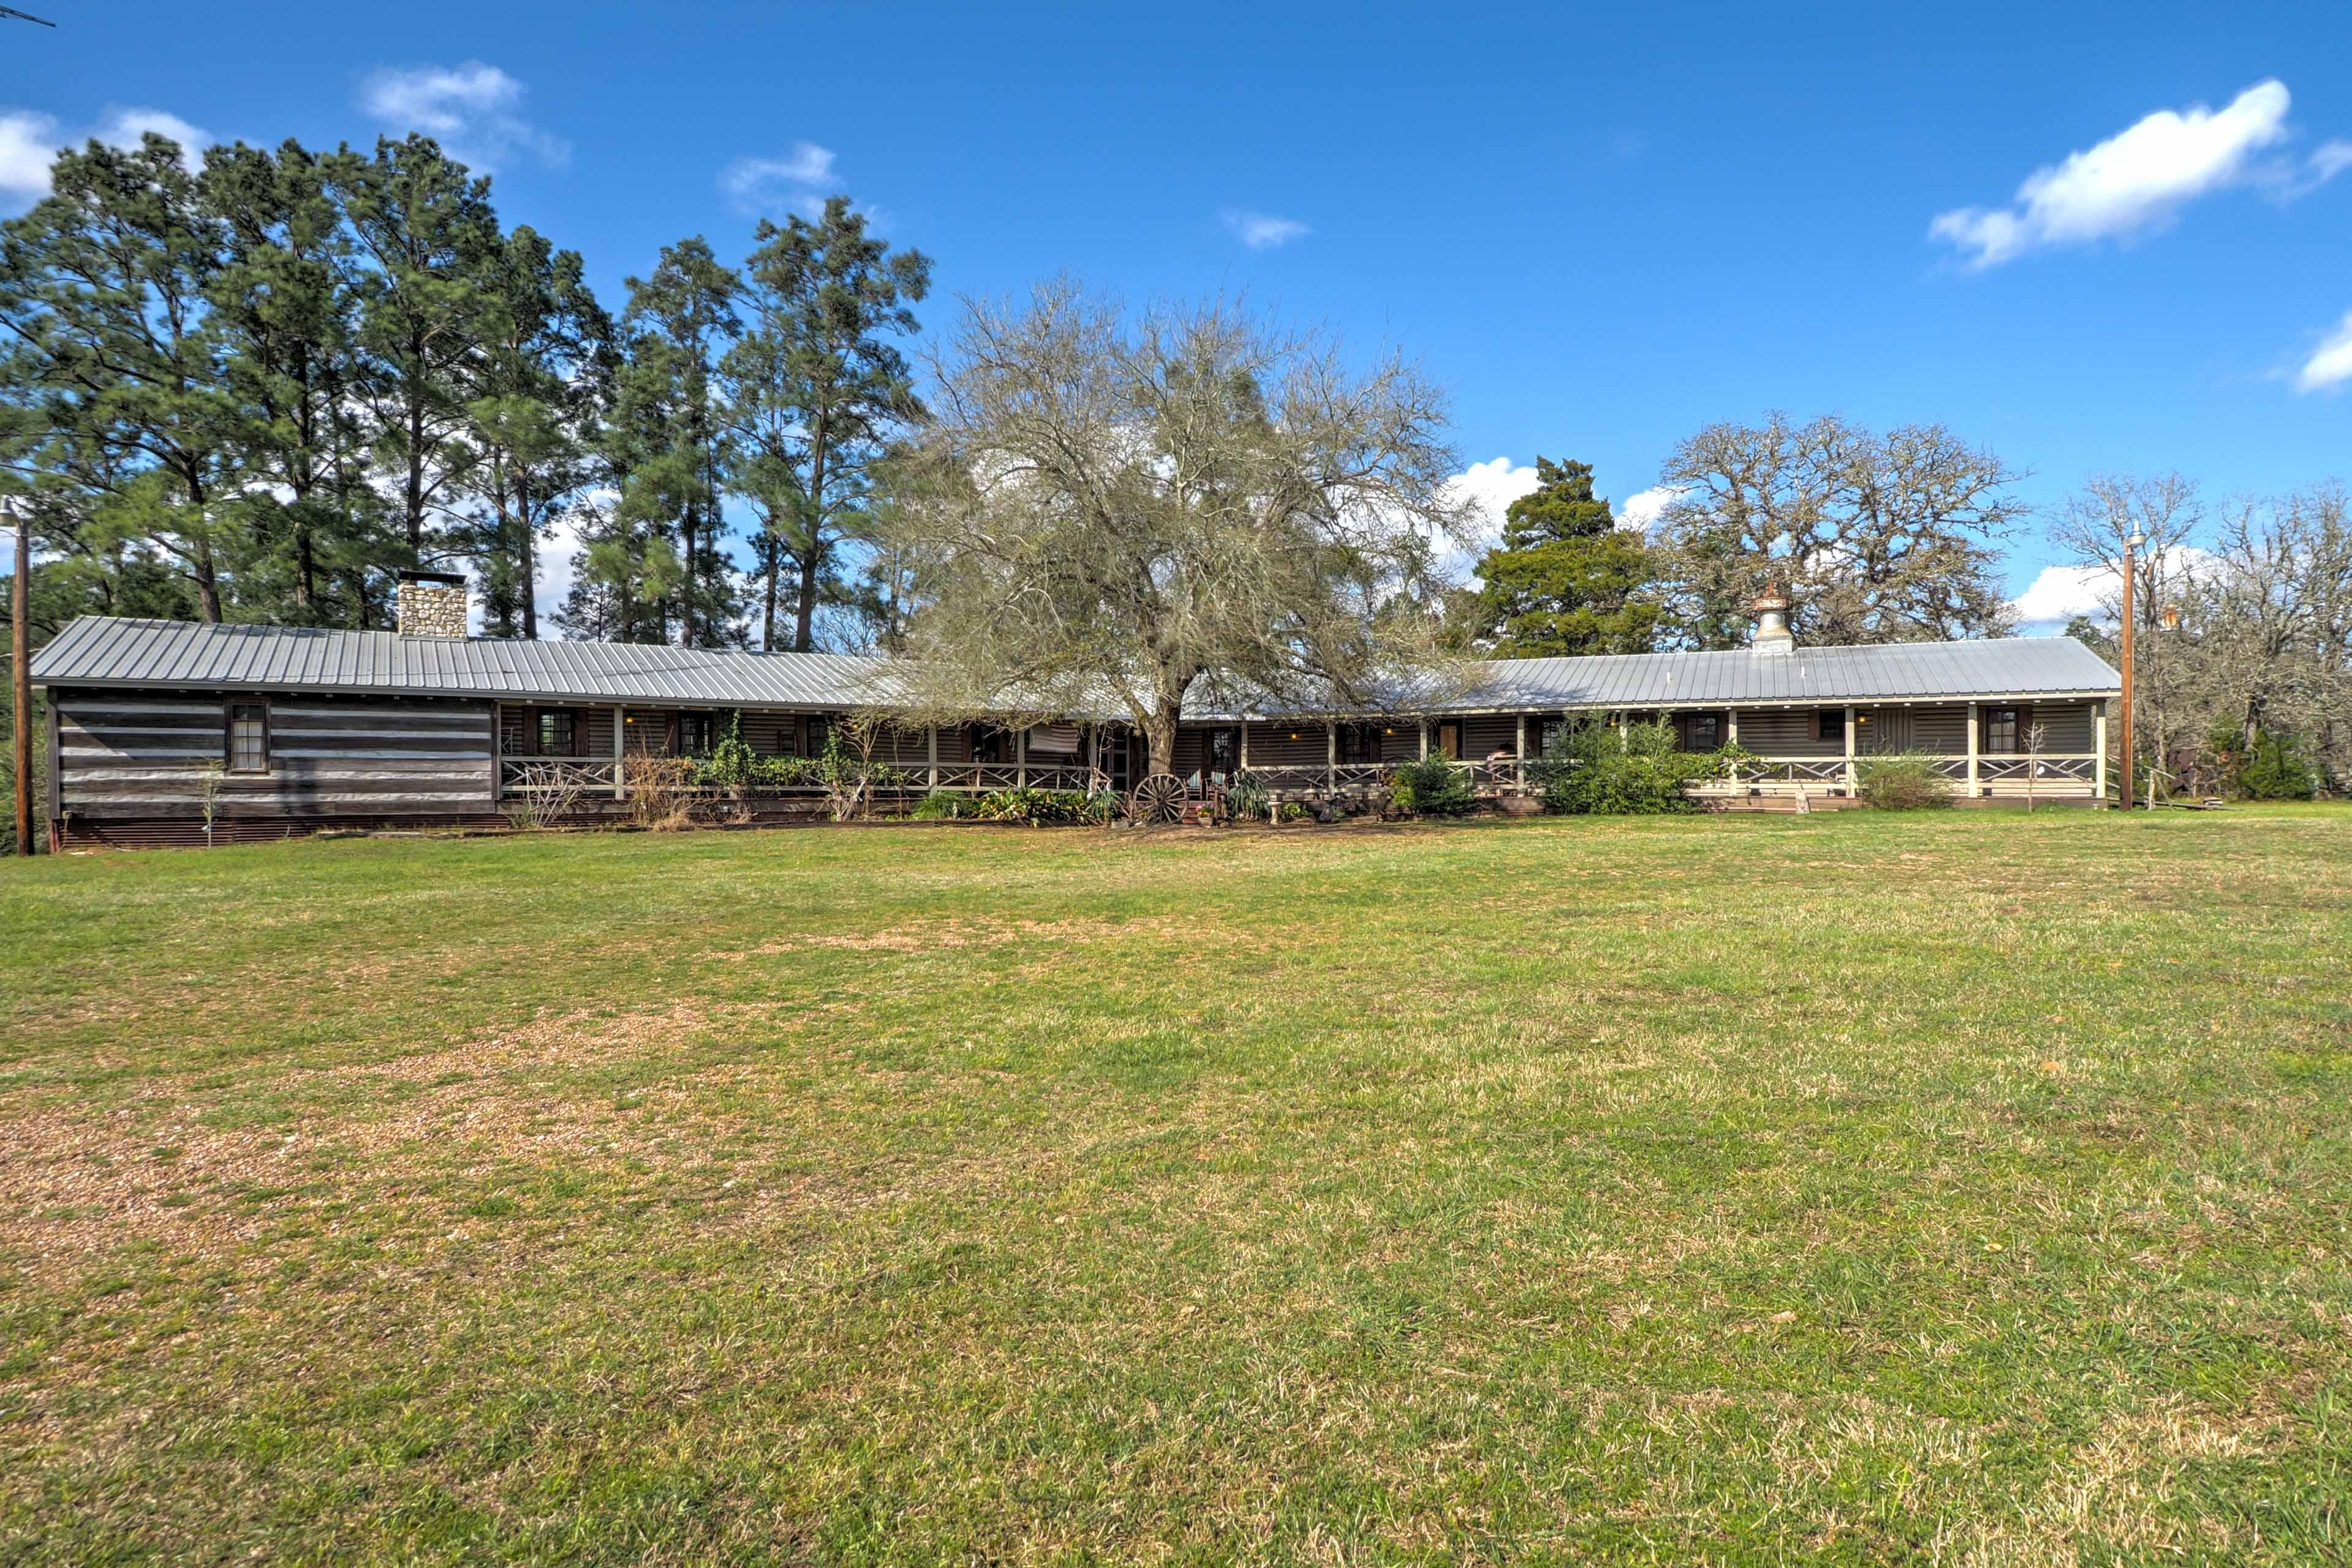 Book this fabulous vacation rental cabin for the ultimate La Grange getaway!